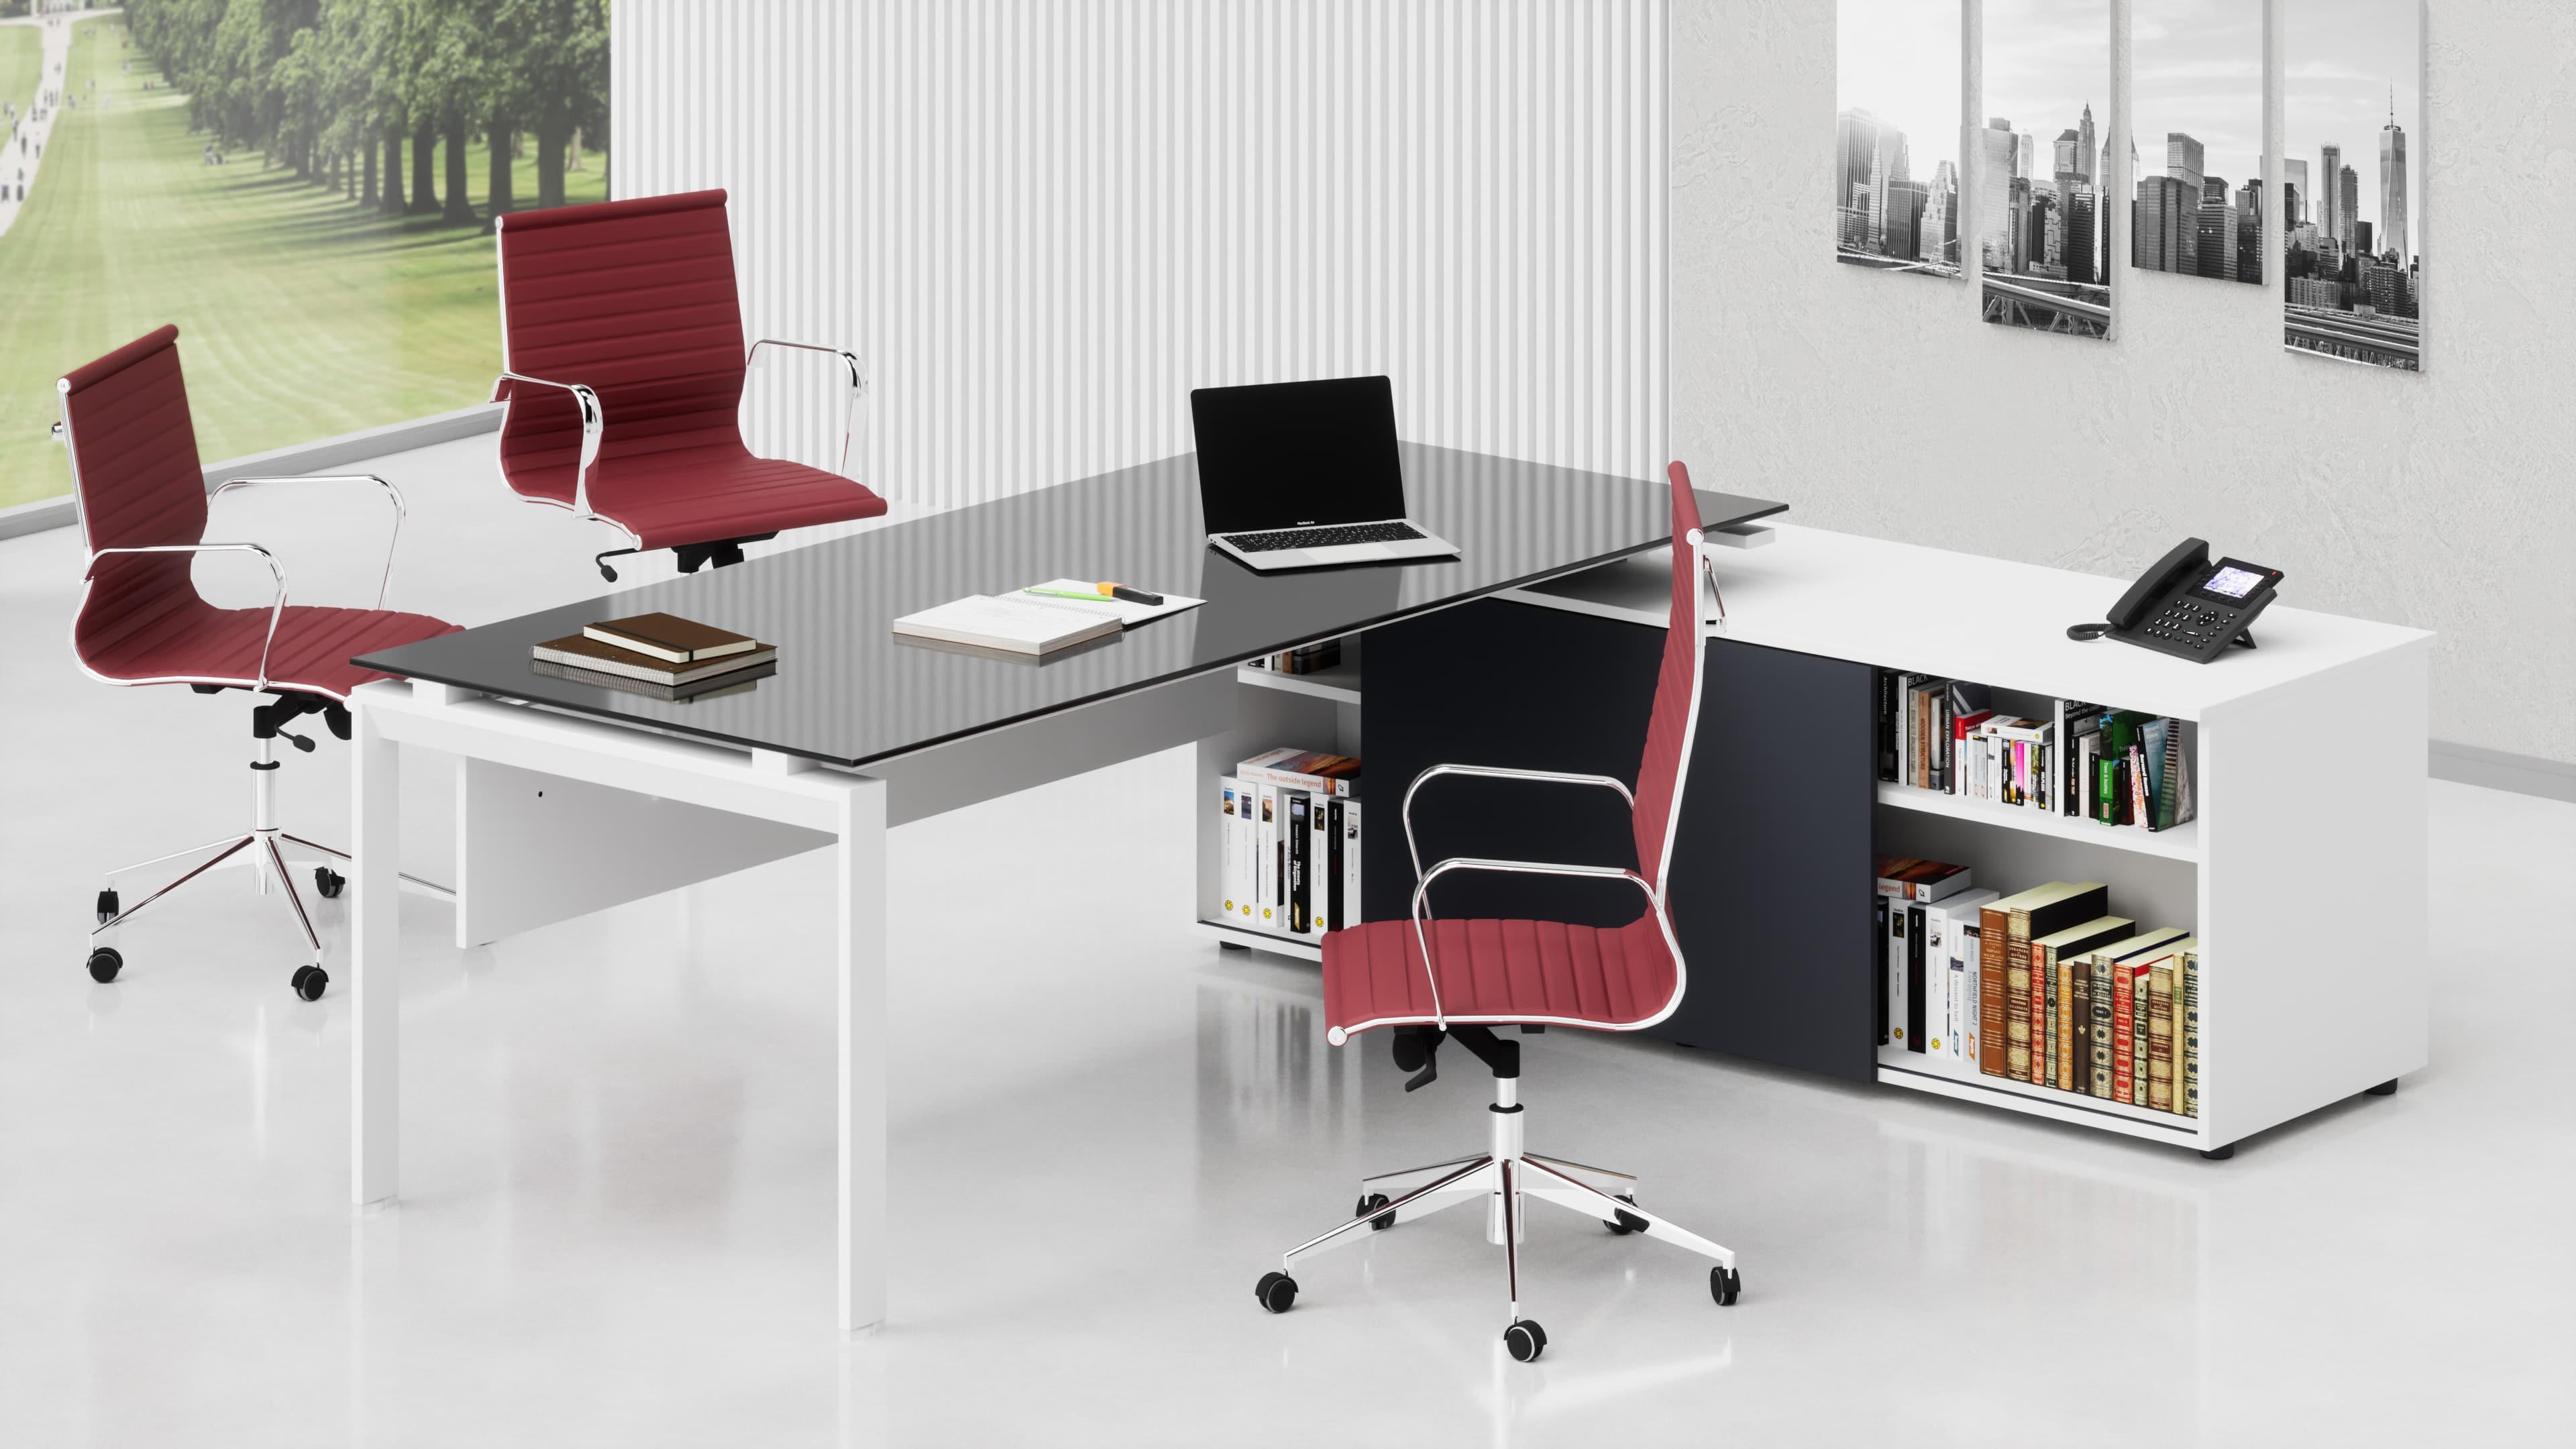 Ss050 vetro fumustore vendita online arredo ufficio for Vendita online mobili per ufficio